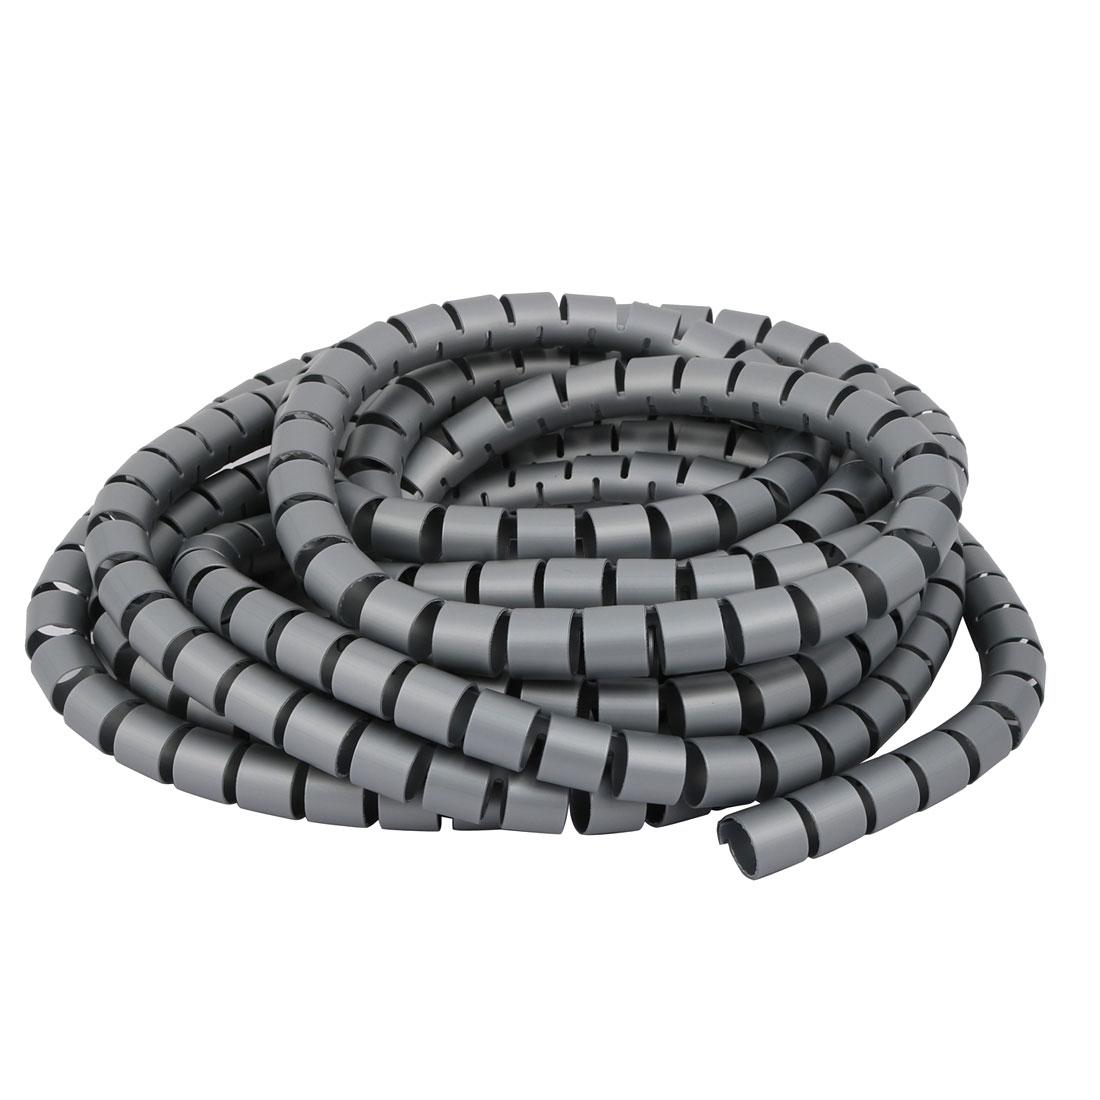 Unique Bargains Flexible Spiral Tube Cable Wire Wrap Gray 15mm Dia x ...